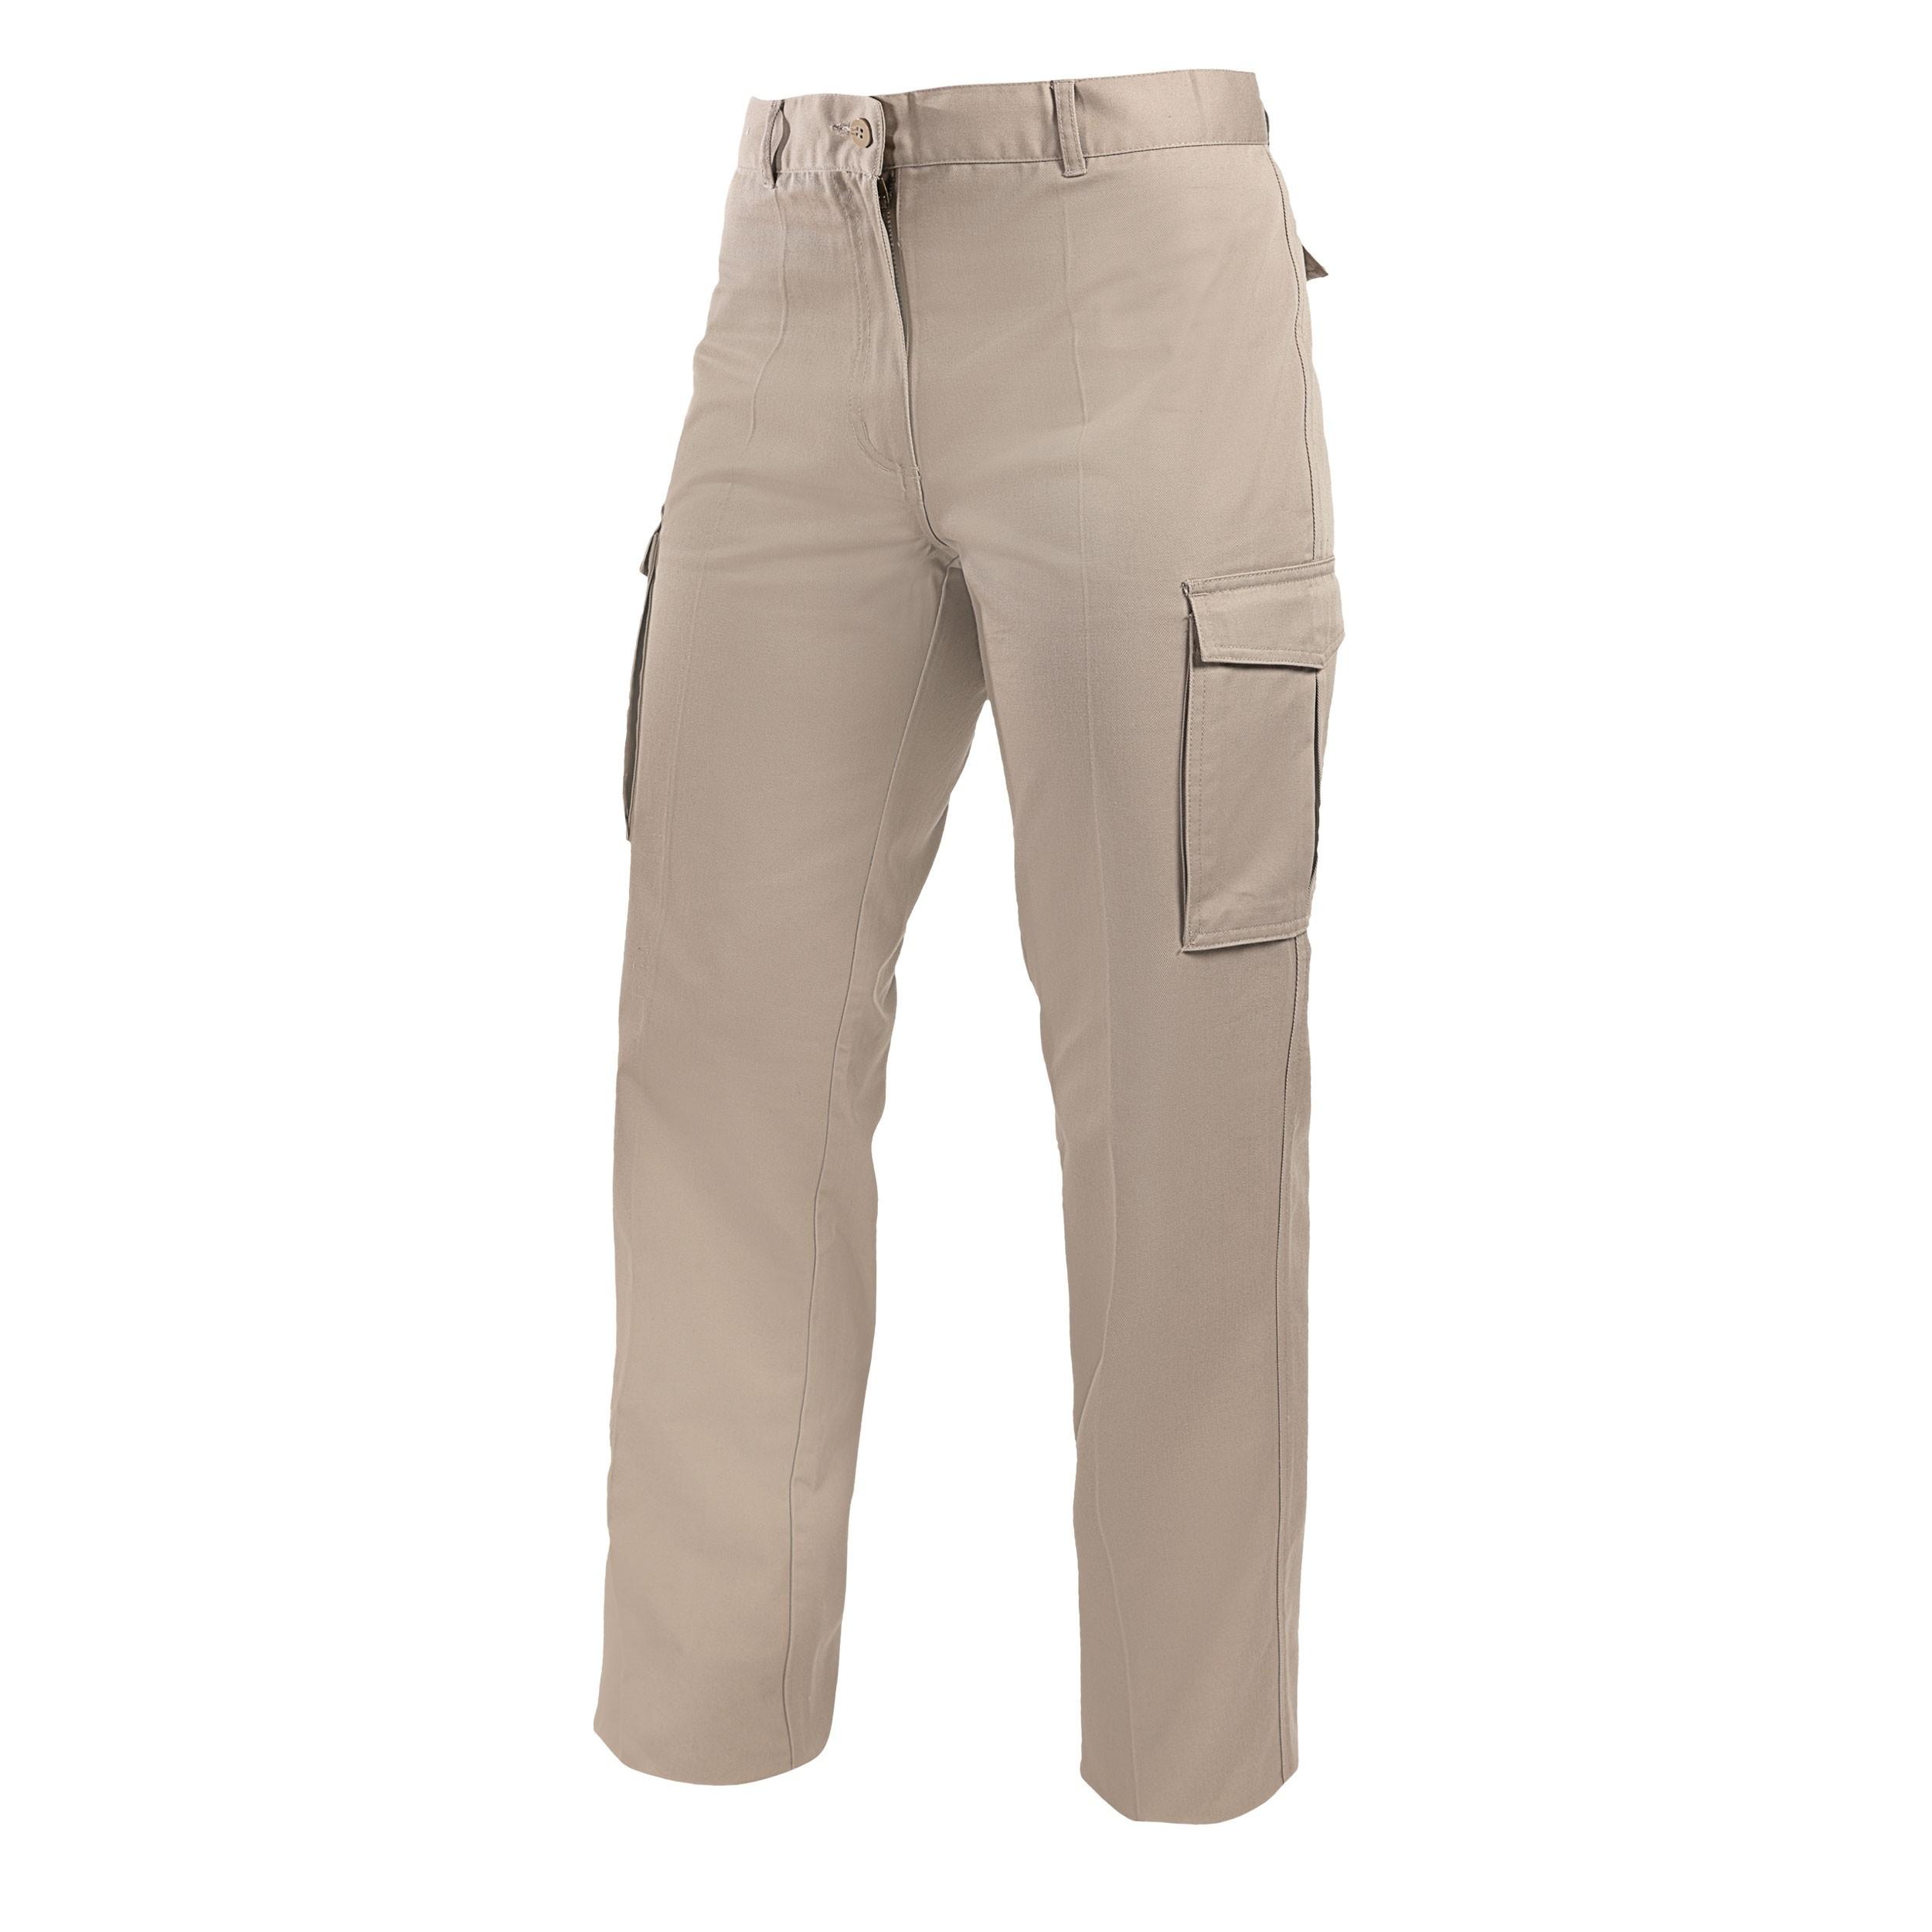 Pantalon Cargo Classic Gabardina Mujer Portal Ropa Empresas Cl